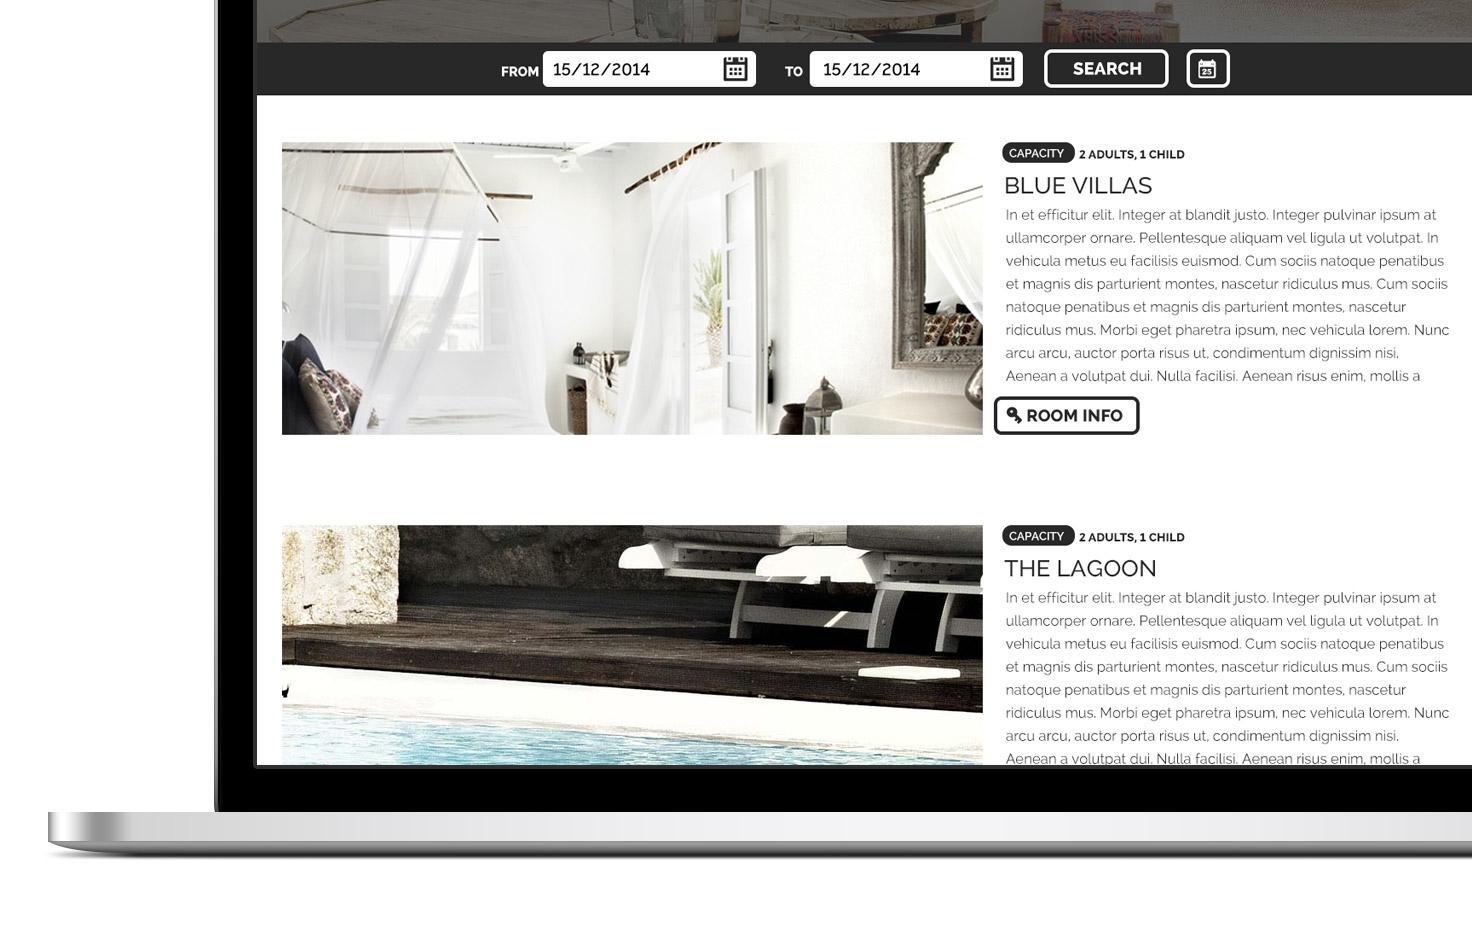 discoveroom website image